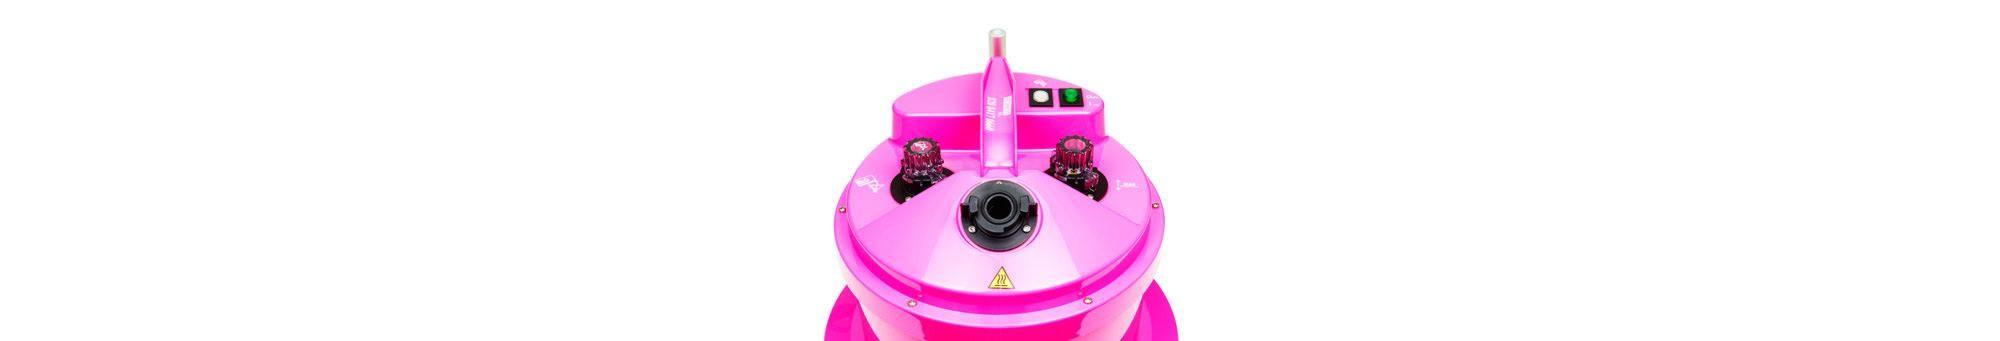 Propress PRO290P Pink steamer, dramatic lighting top view